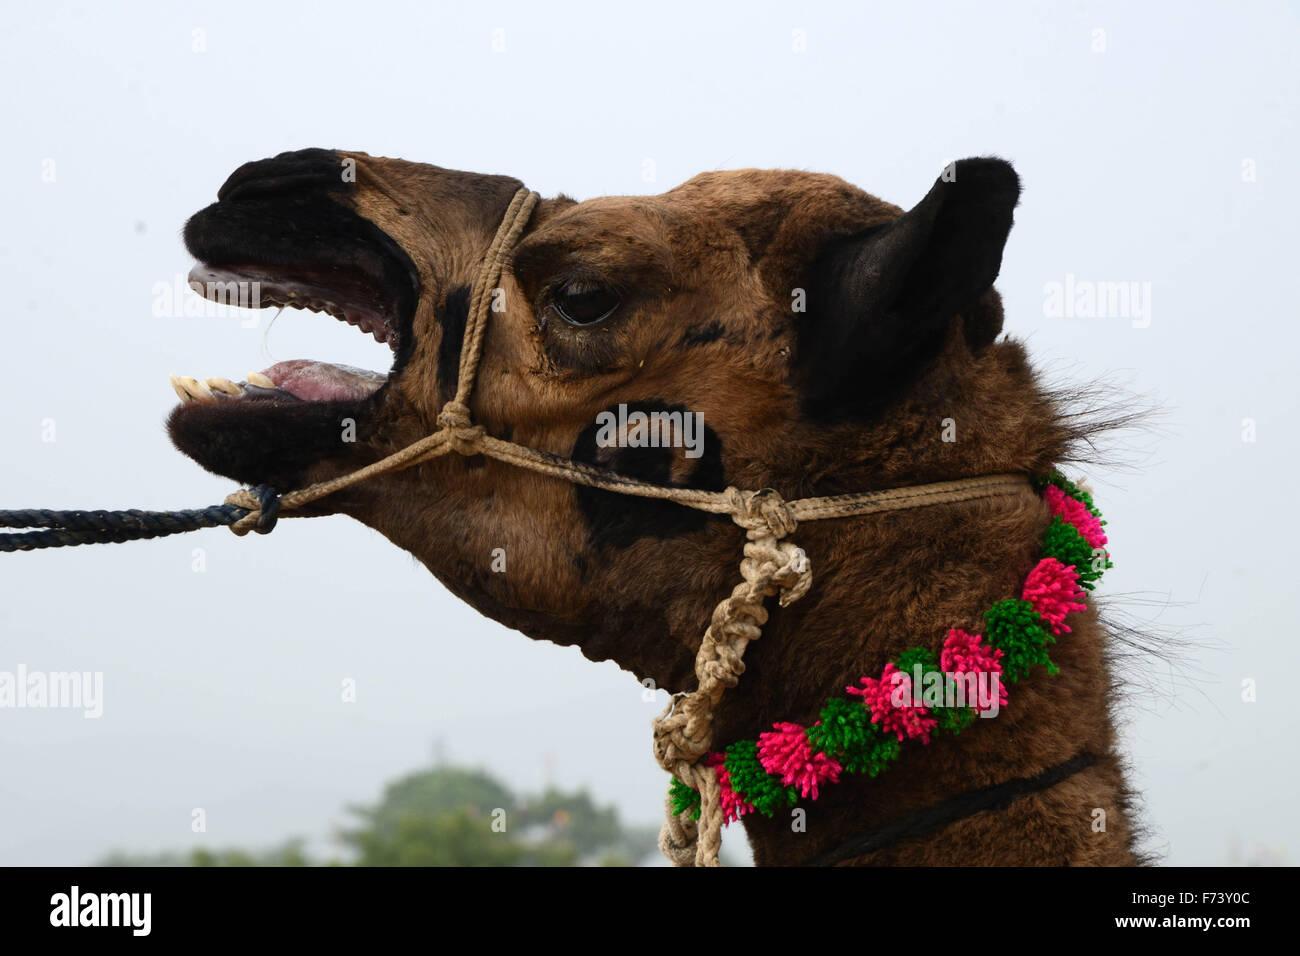 Kamel im Viehmarkt, Pushkar, Rajasthan, Indien, Asien Stockbild